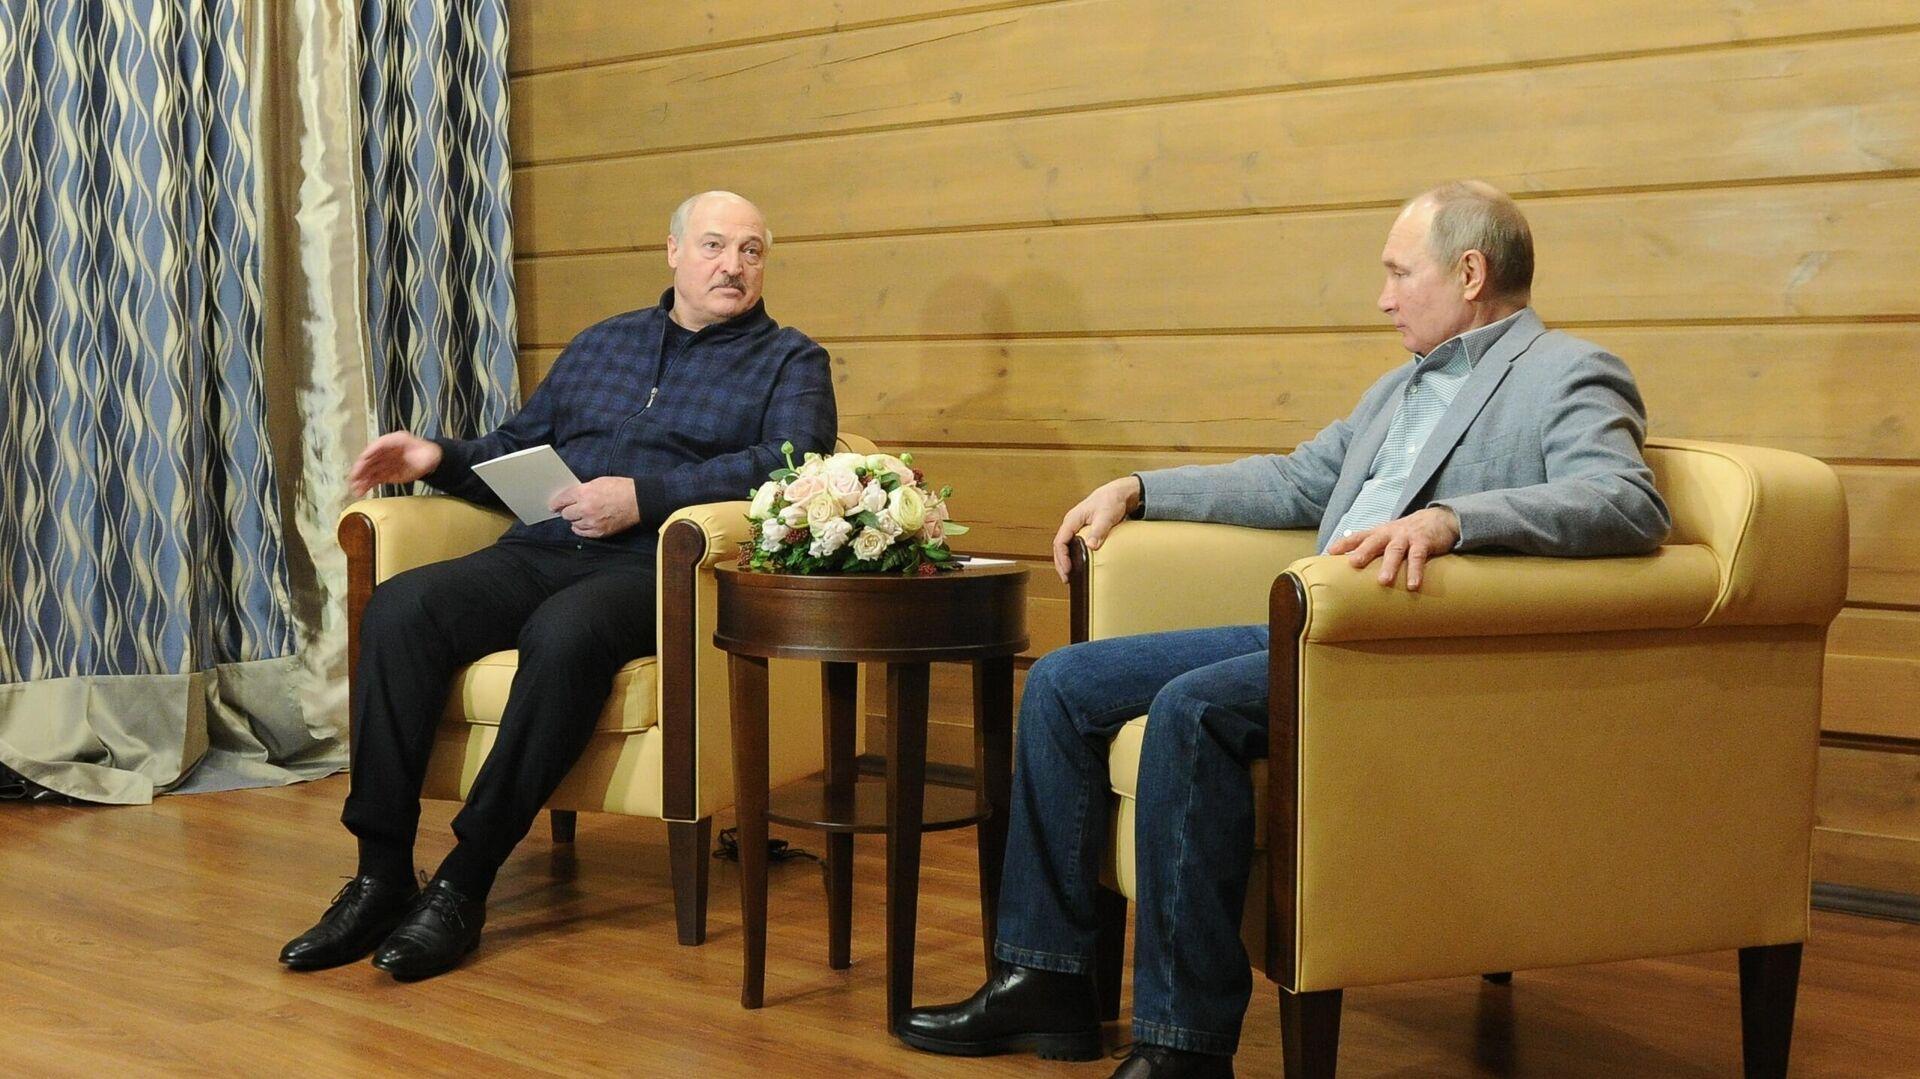 Президент РФ Владимир Путин и президент Белоруссии Александр Лукашенко во время встречи - РИА Новости, 1920, 02.03.2021